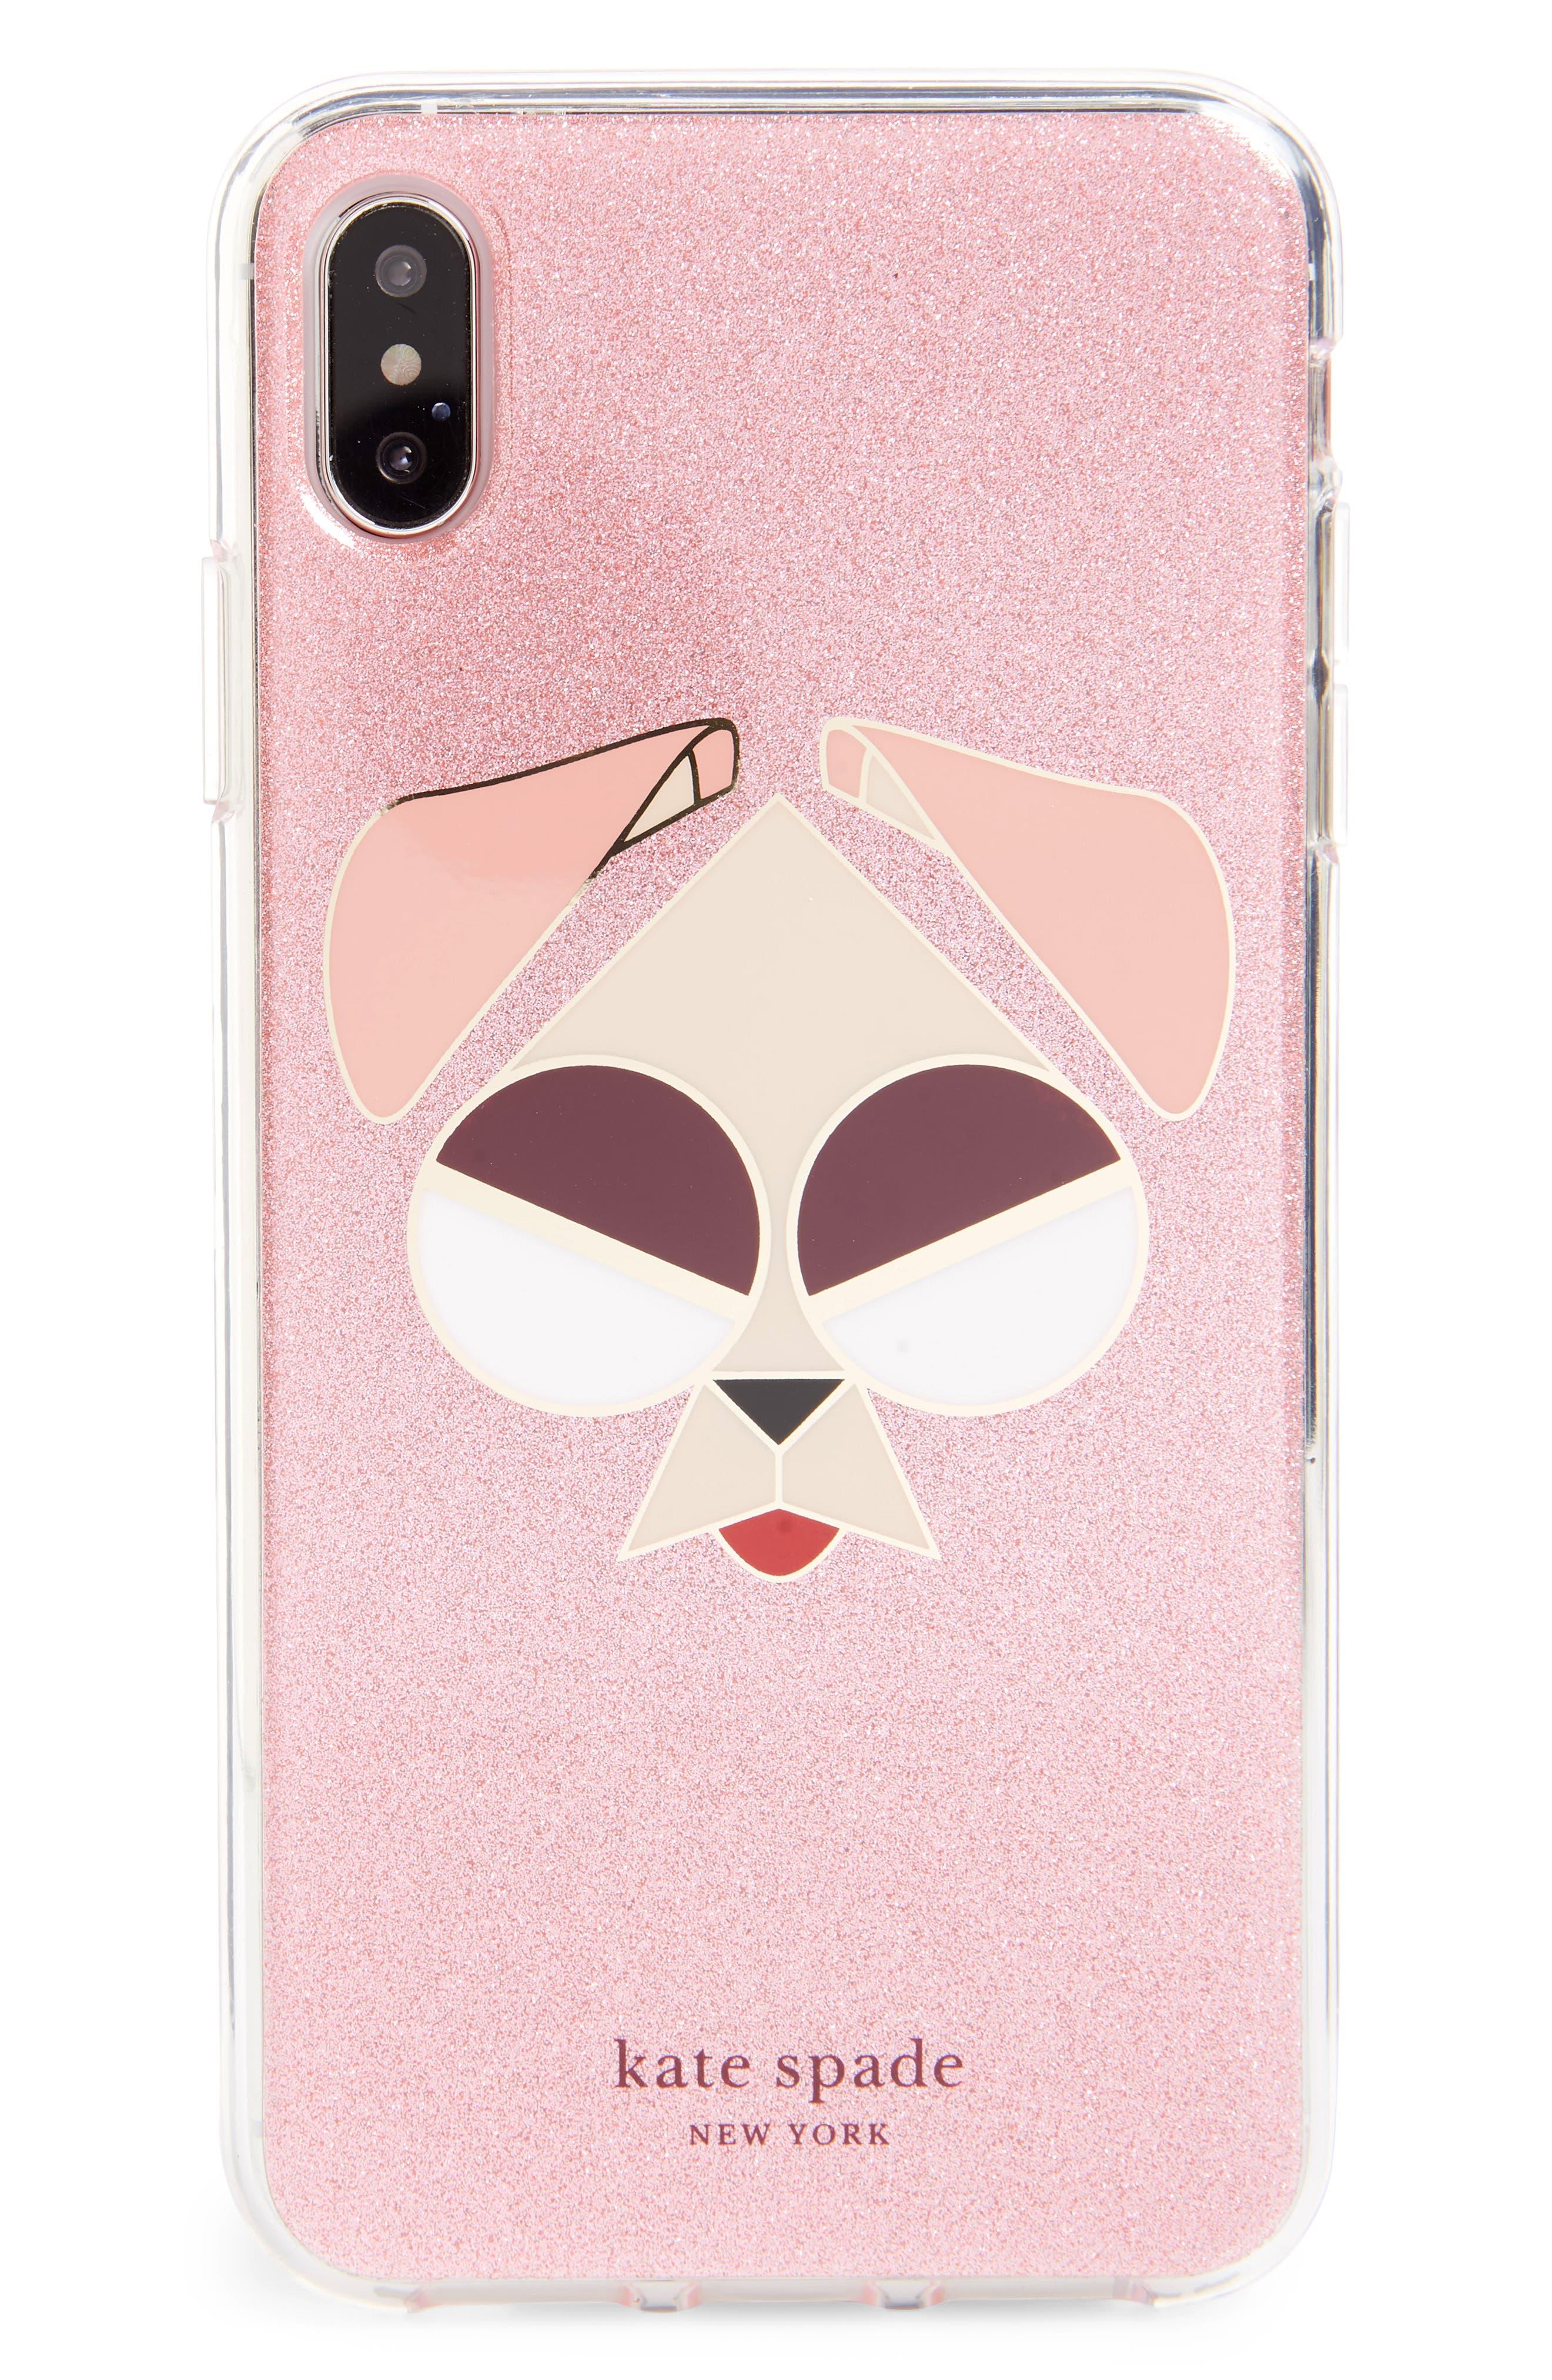 Kate Spade New York Glitter Mod Dog Iphone X/xs/xr & Xs Max Case - Pink